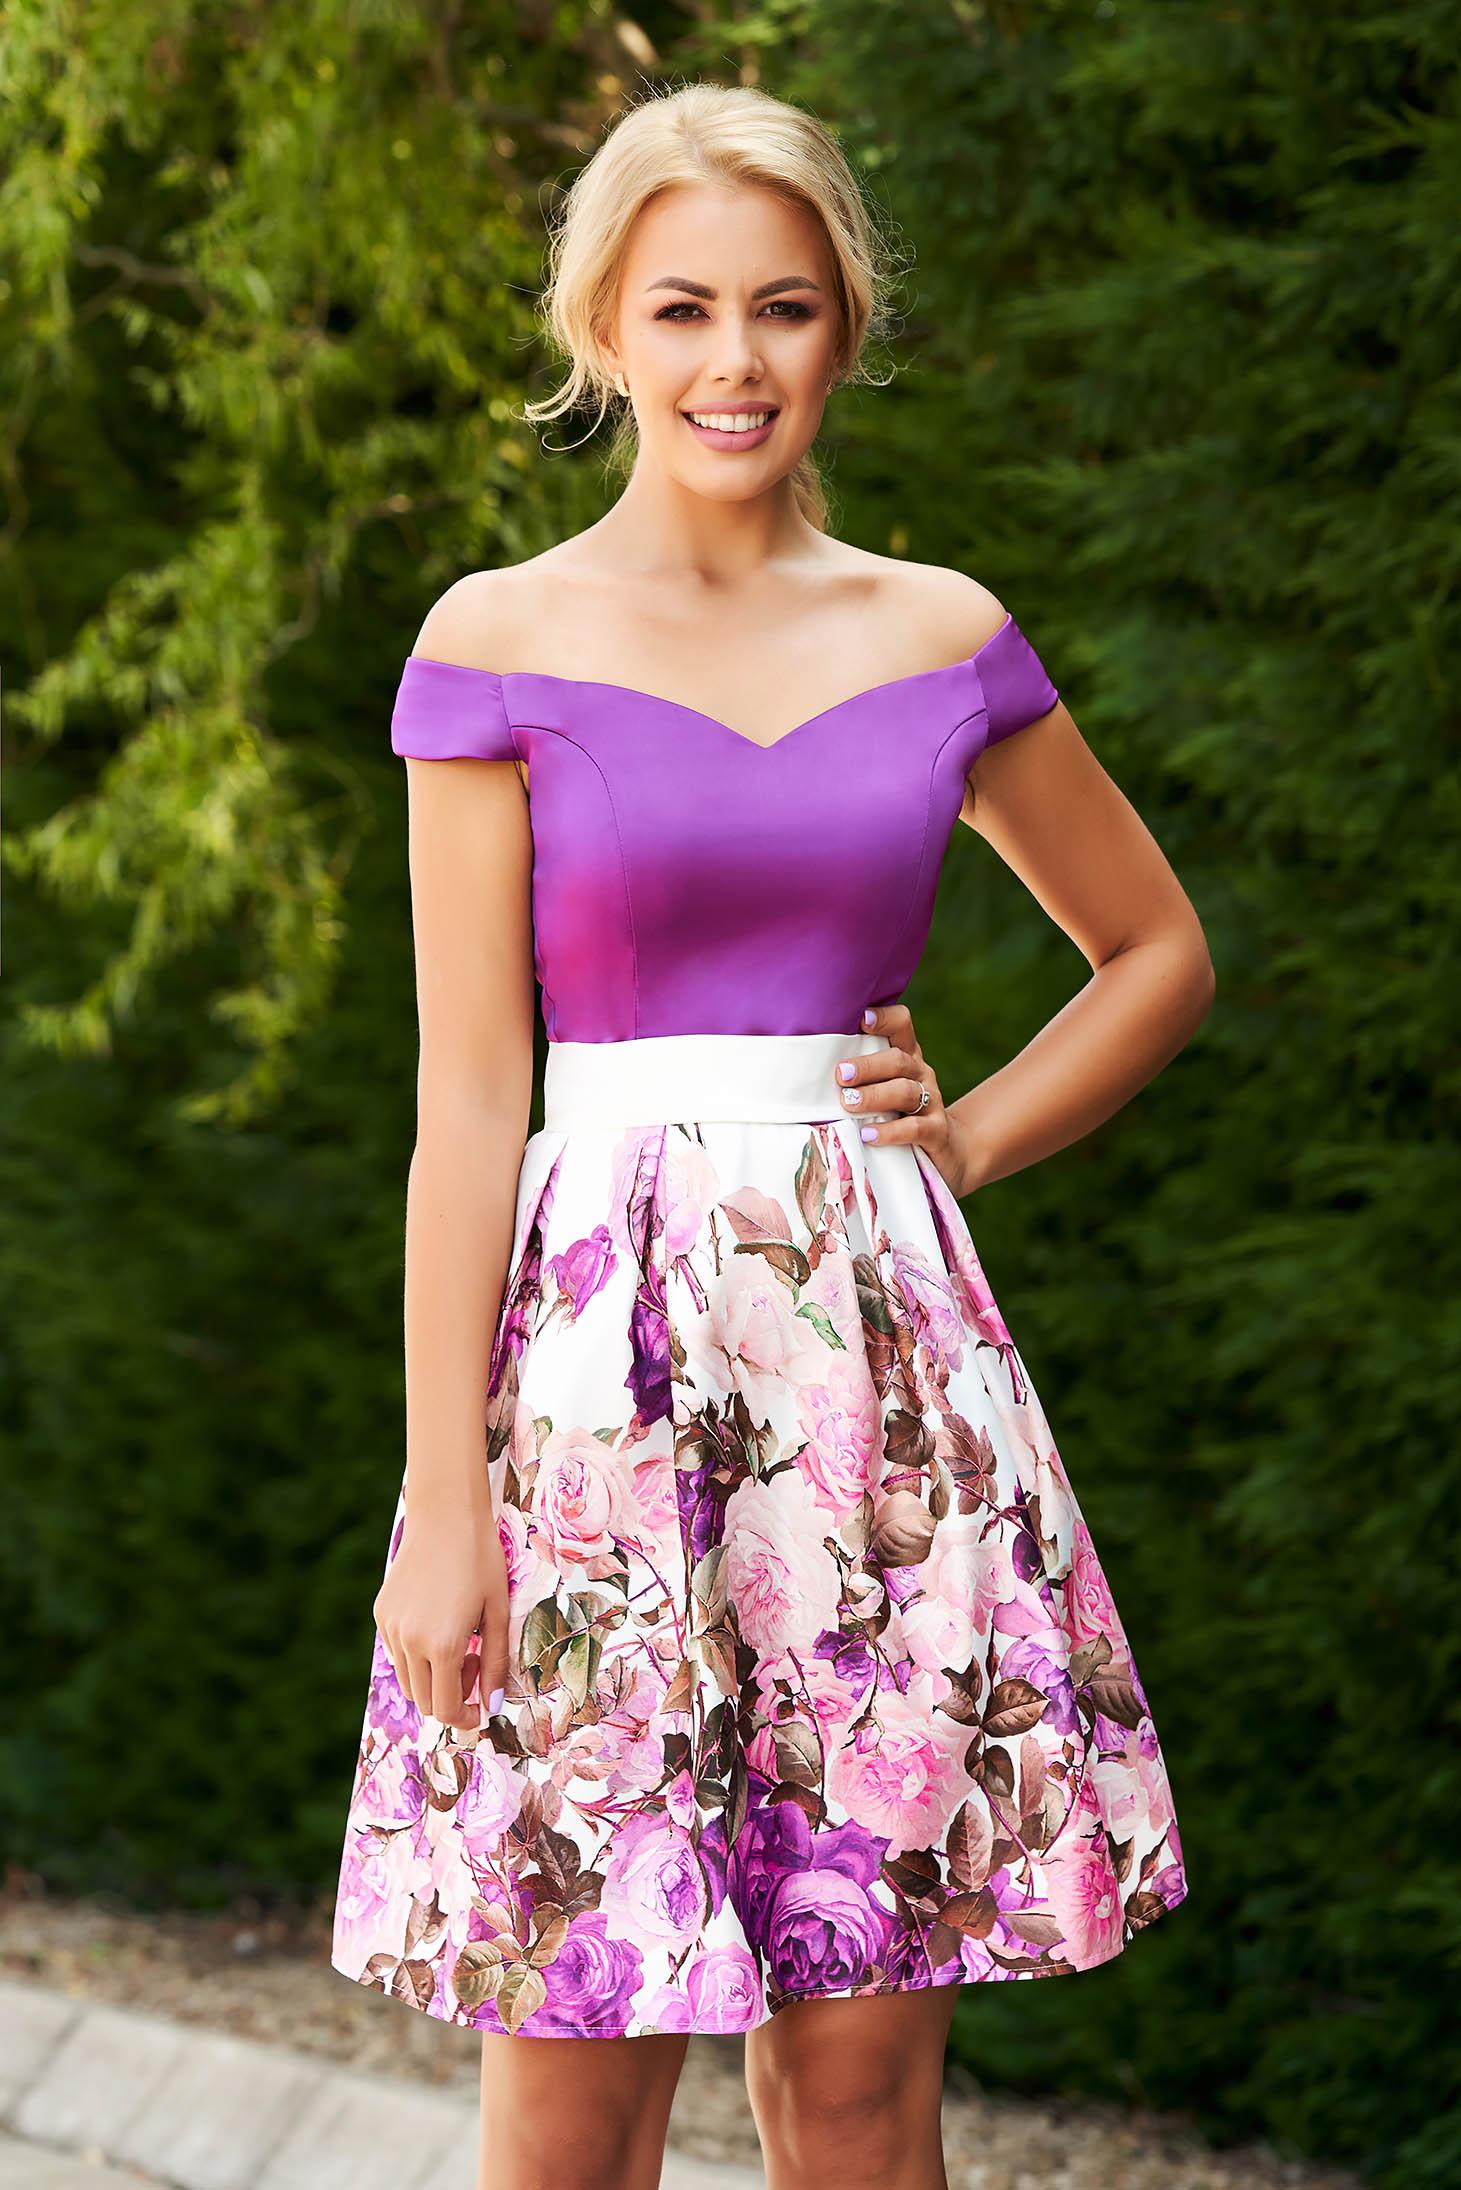 Rochie StarShinerS mov scurta de ocazie in clos din satin cu imprimeu floral si cordon detasabil